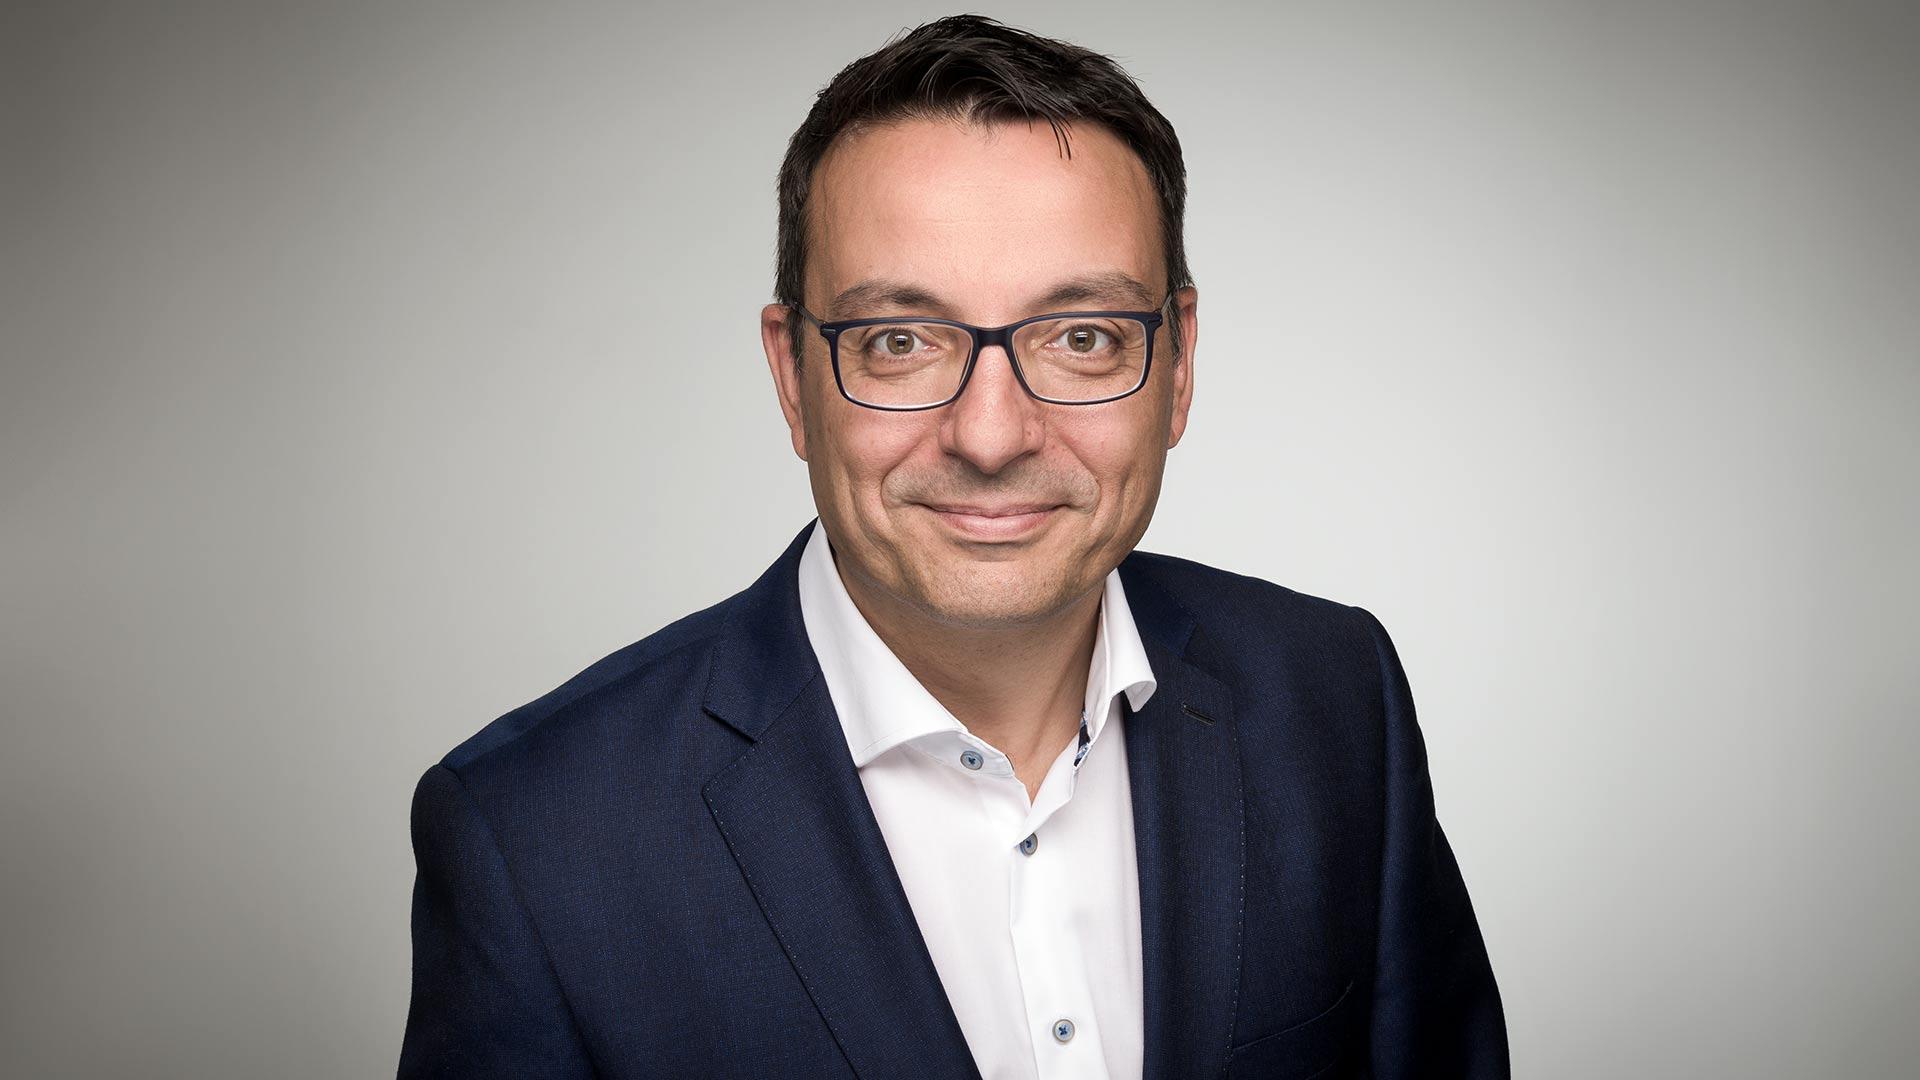 Wigand Maethner, Geschäftsführer der Osnabrücker Parkstätten-Betriebsgesellschaft